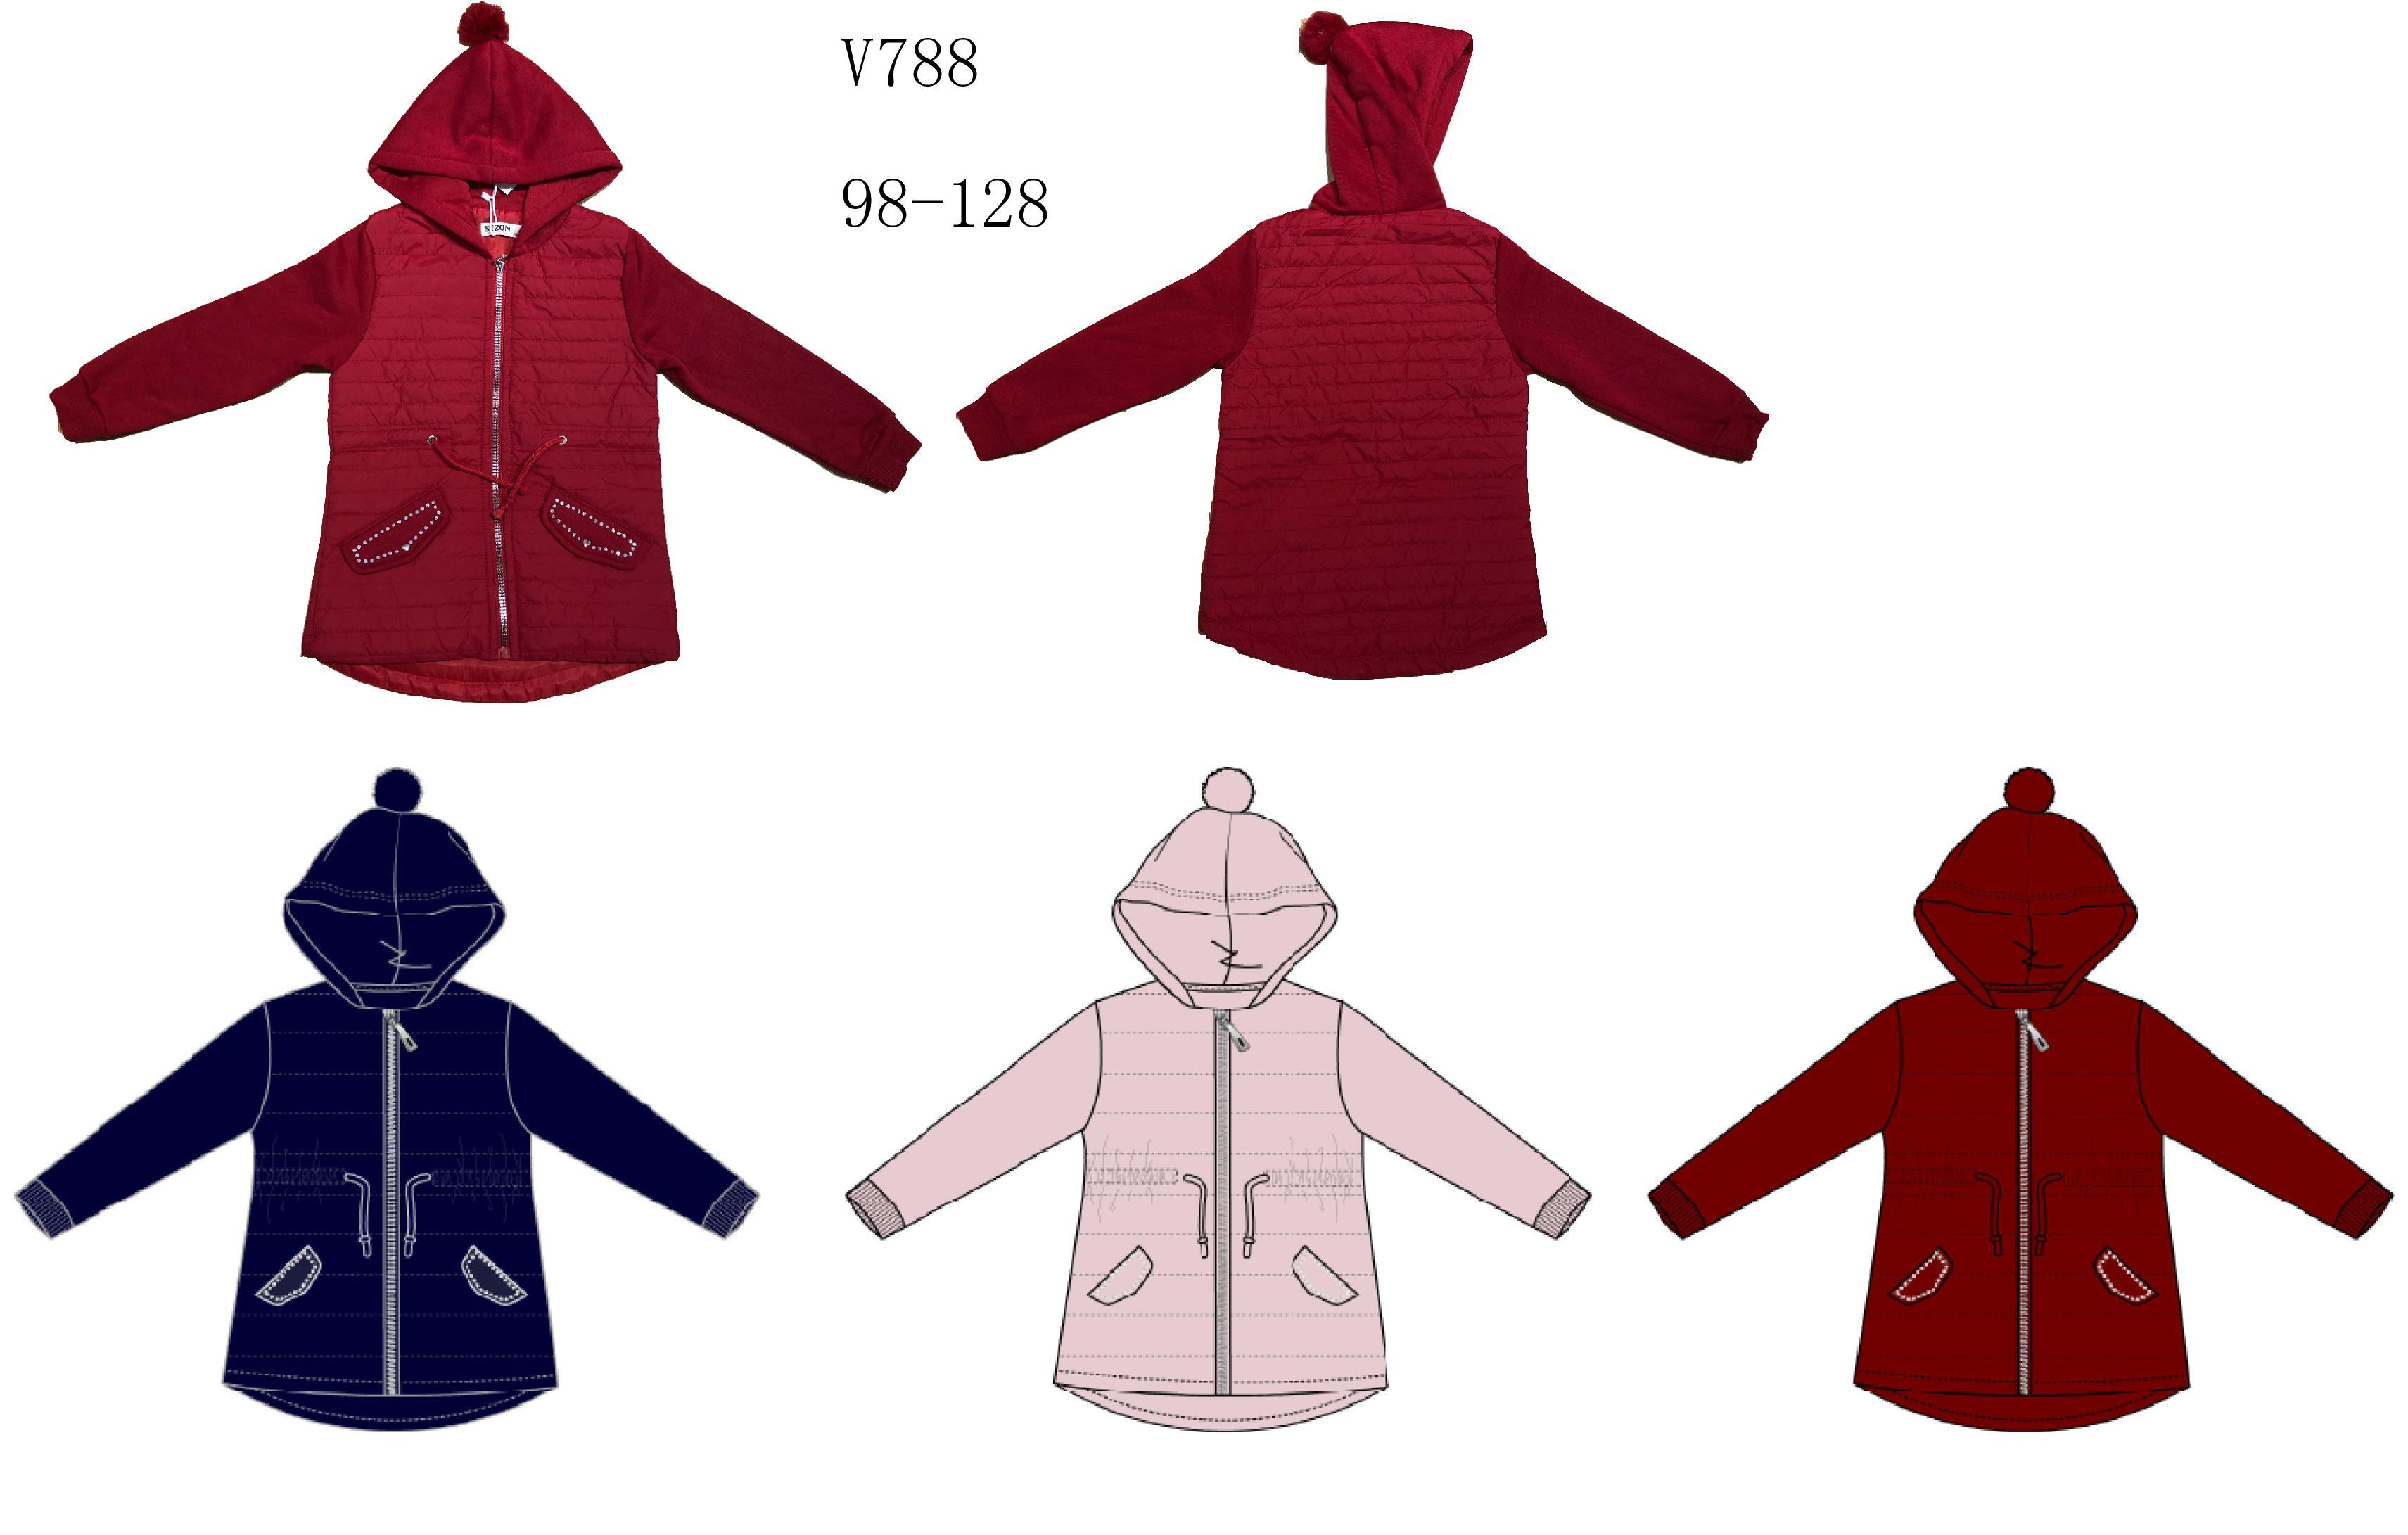 Dívčí mikino- bunda SEZON (98-128)